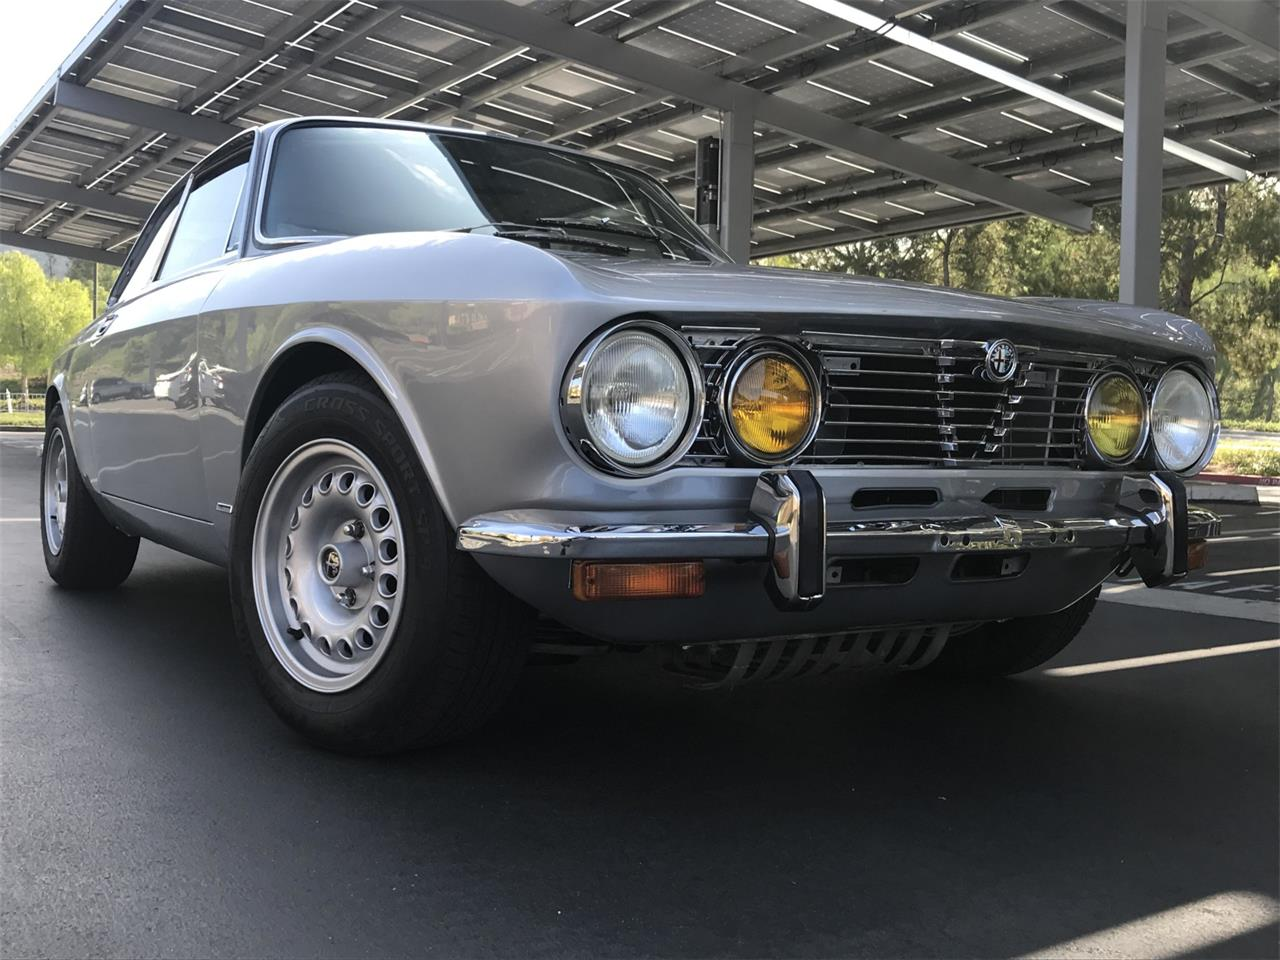 1974 Alfa Romeo 1750 GTV (CC-1256292) for sale in Irvine, California